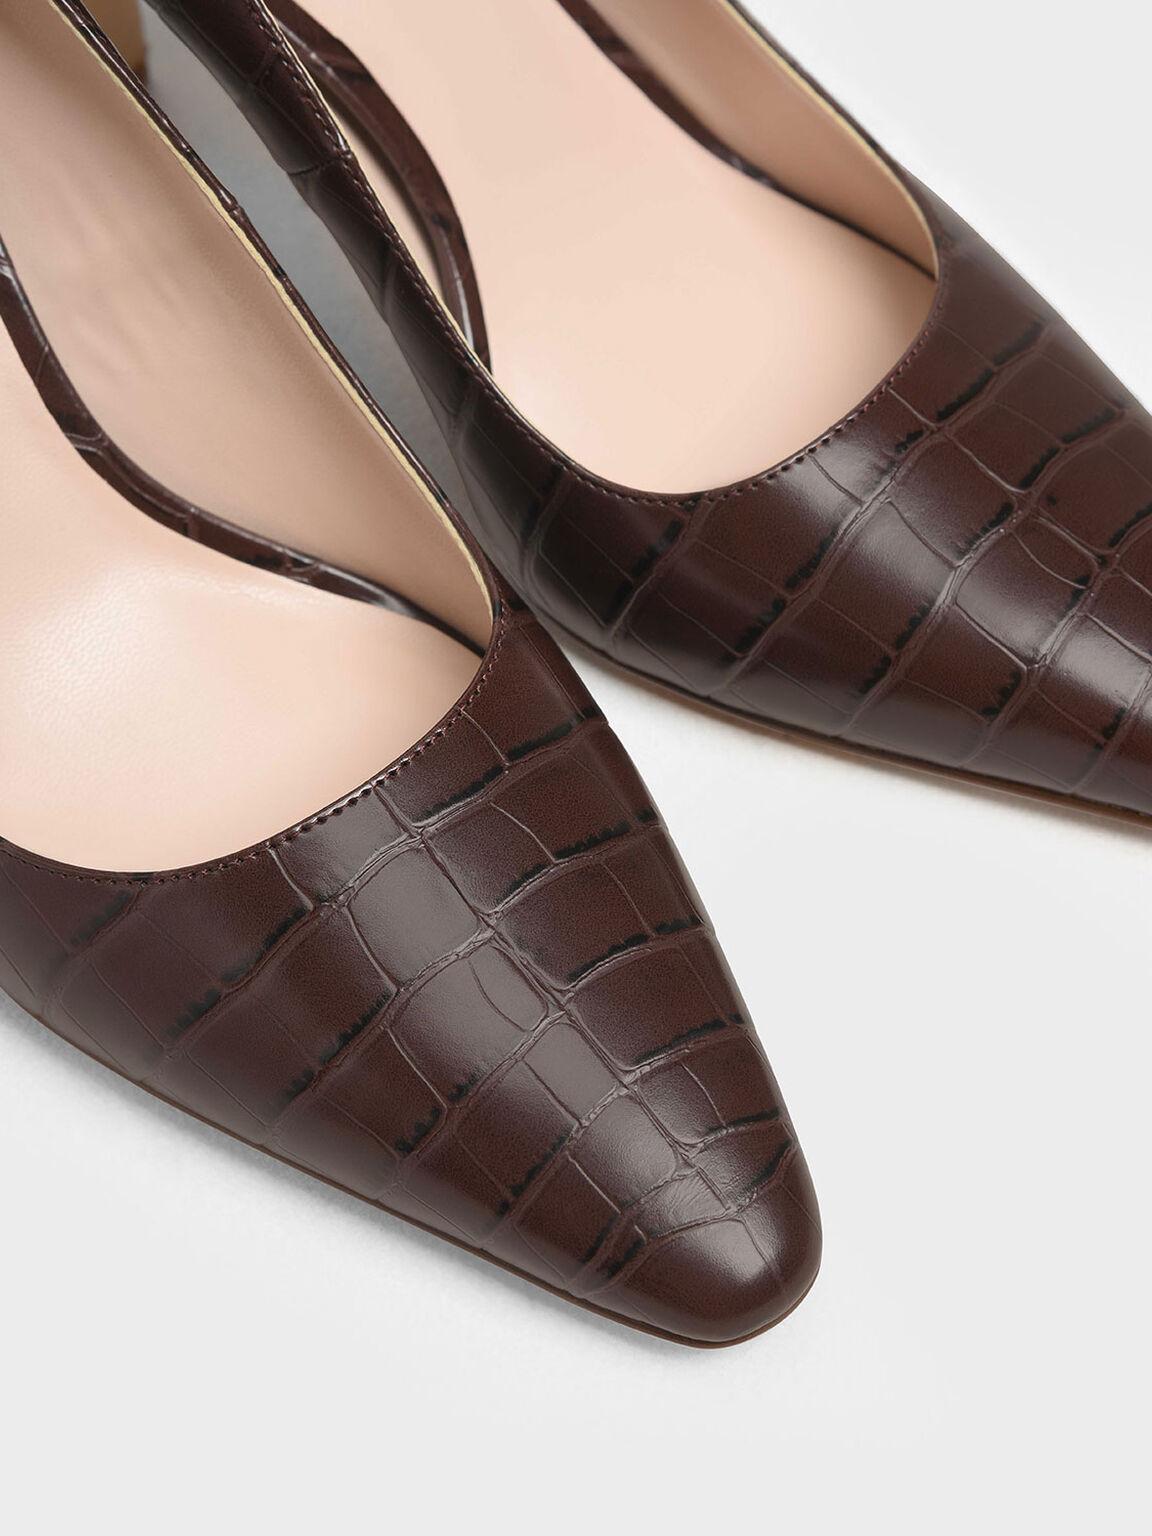 Croc-Effect Chunky Heel Pumps, Brown, hi-res